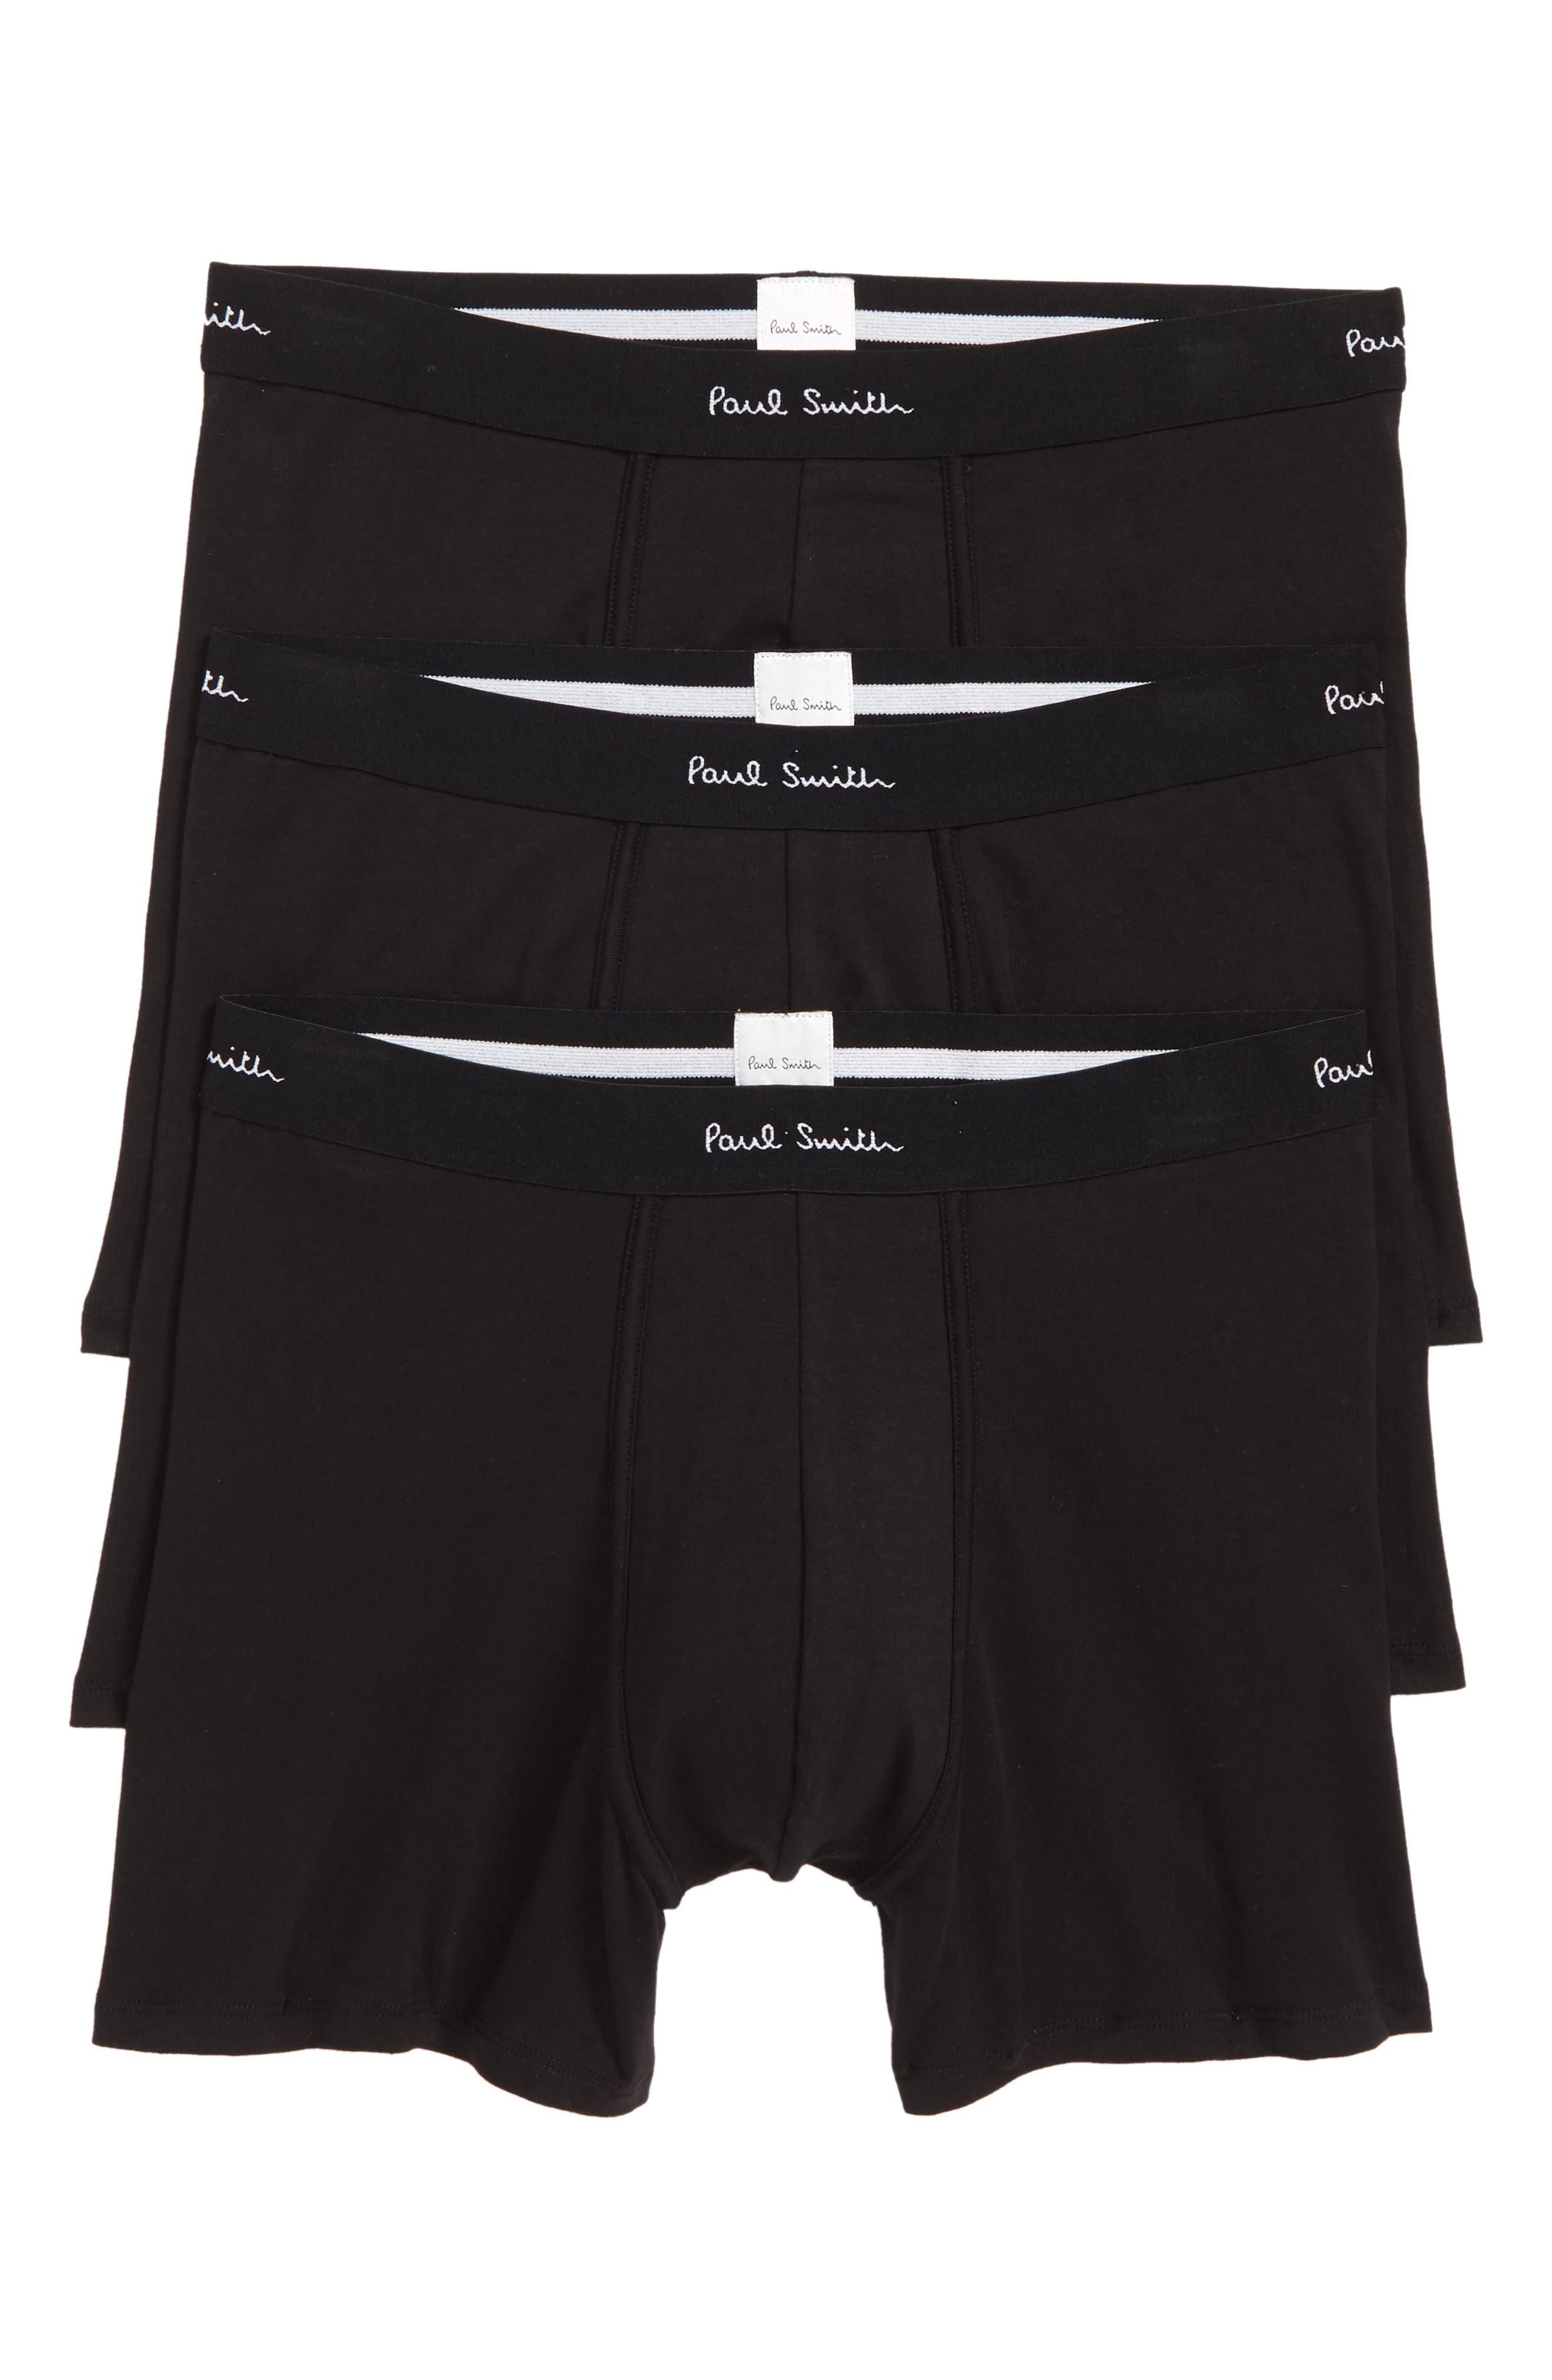 3-Pack Trunks,                         Main,                         color, BLACK